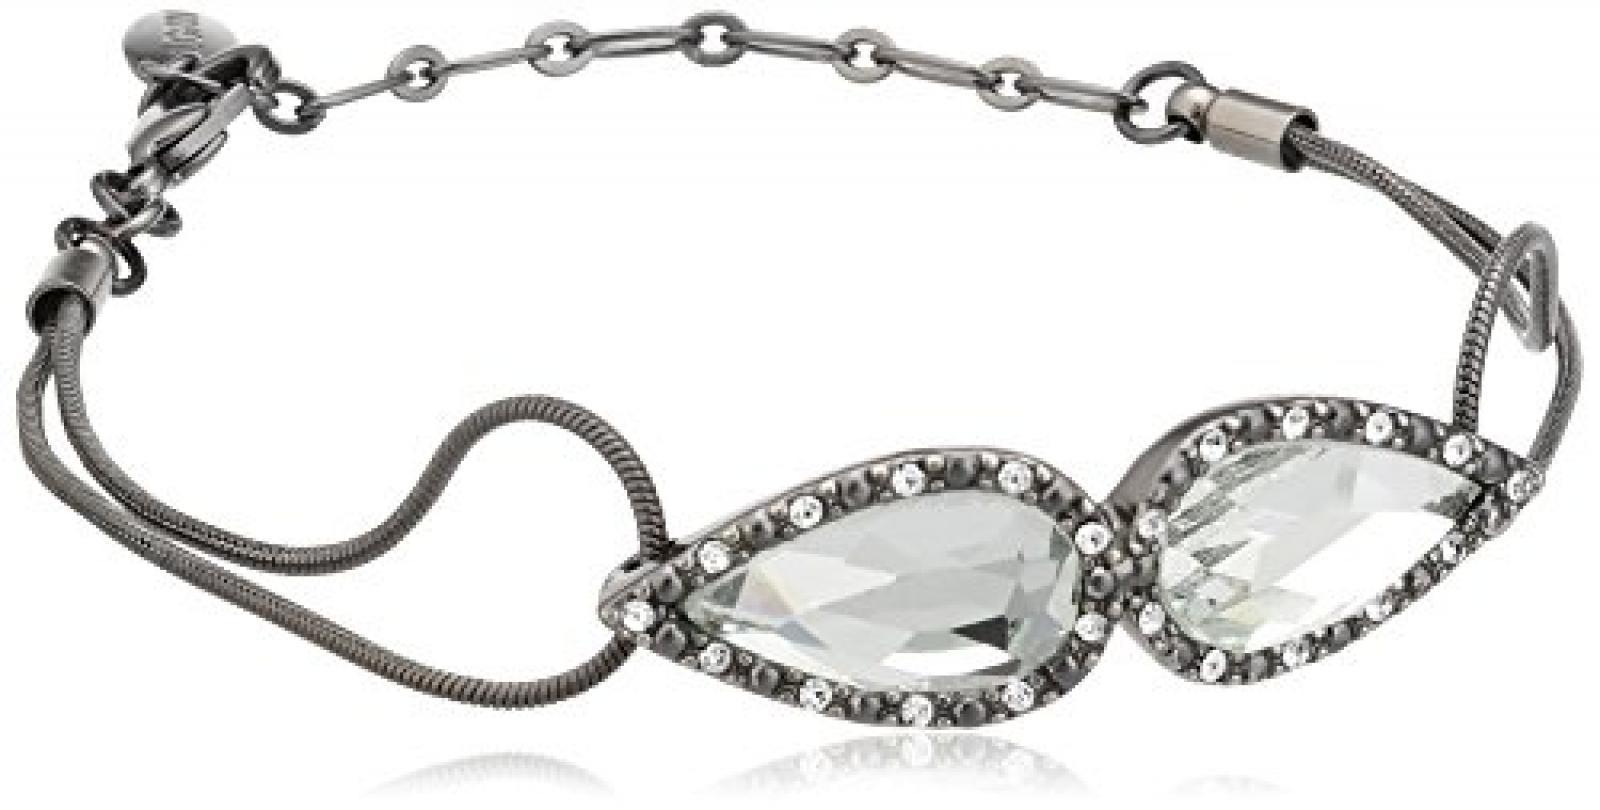 Pilgrim Damen-Armband delicate night hematite plated kristall 22 cm 12114-3002